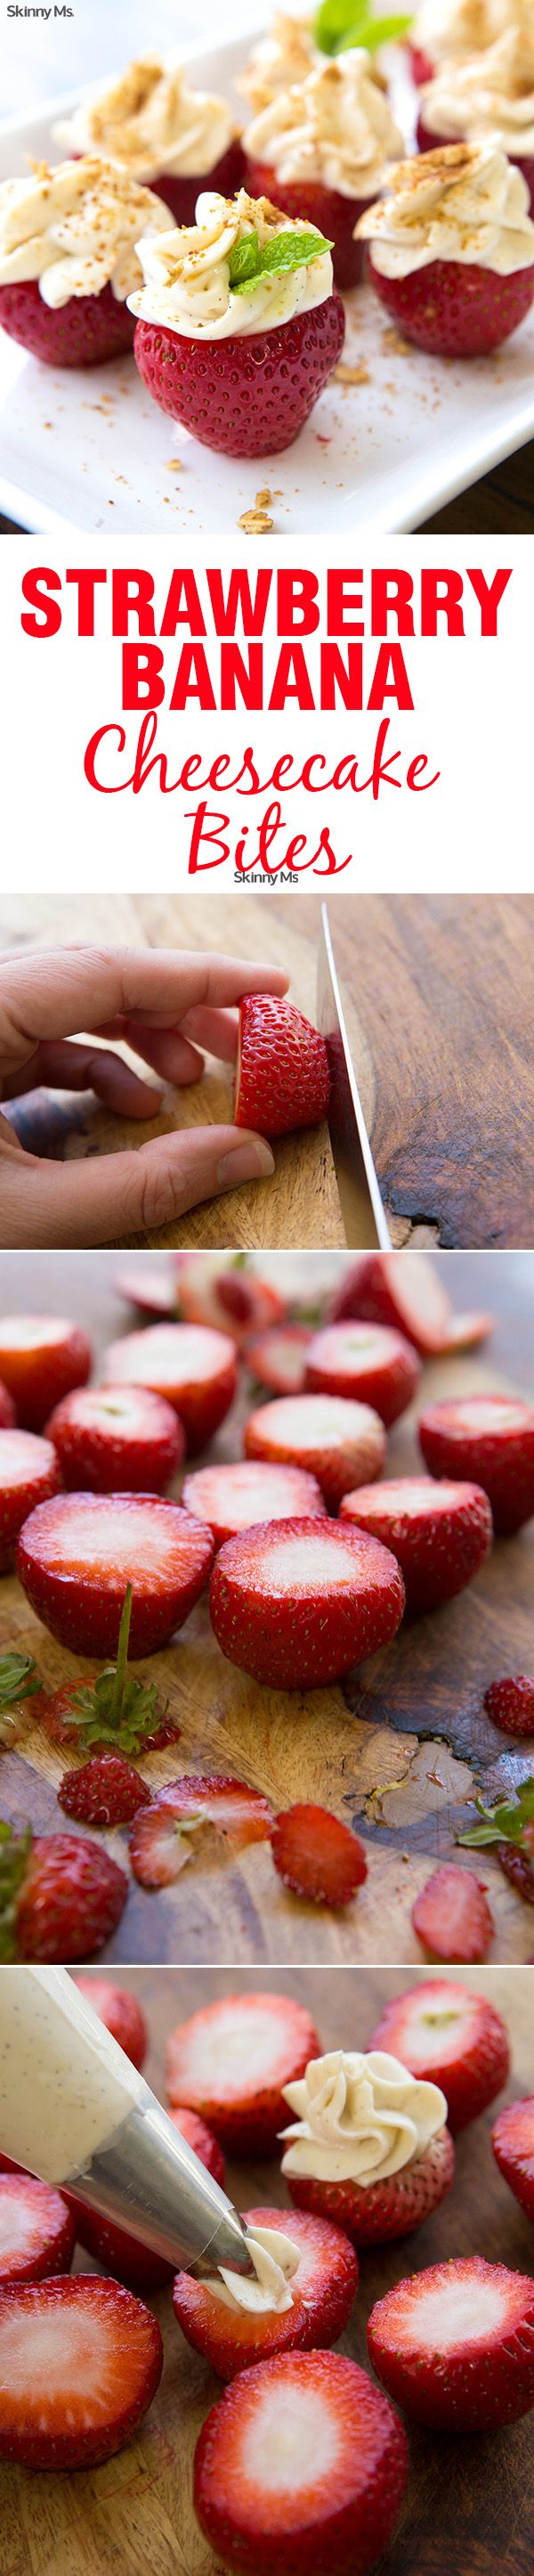 sennheiser Strawberry Banana Cheesecake Bites Recipe Sweets Cheesecake Bites and Cheesecake